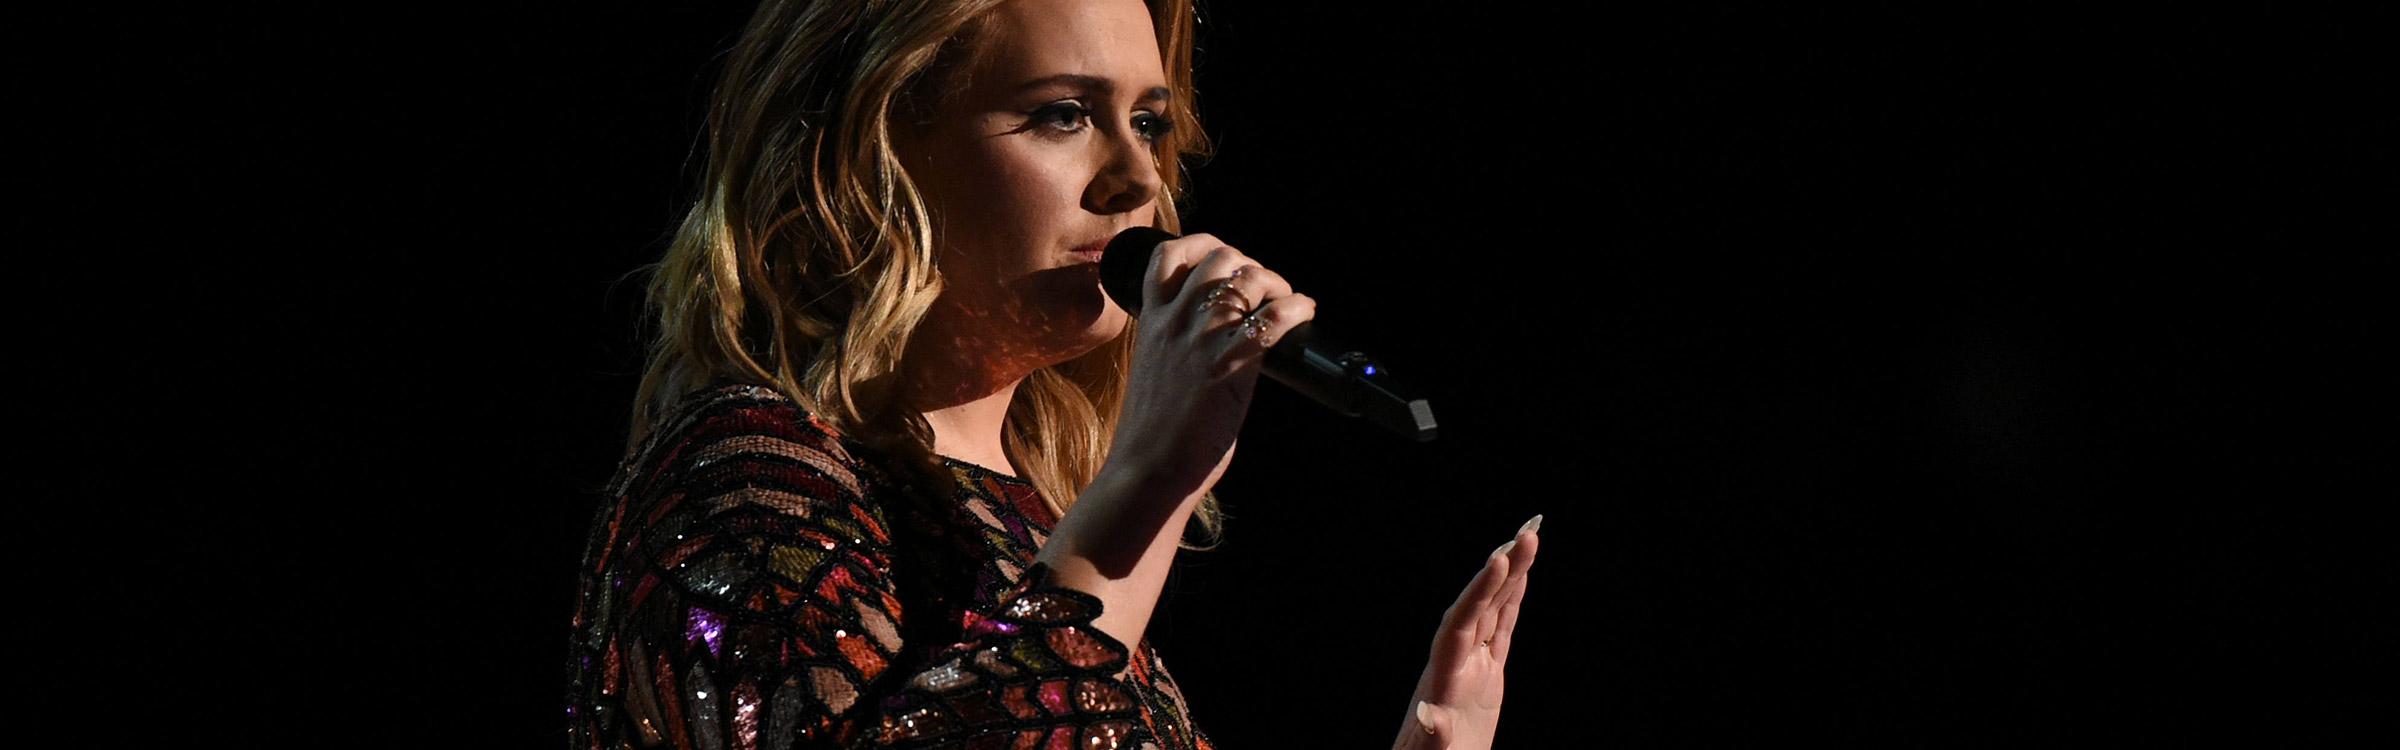 Adele afbeelding header